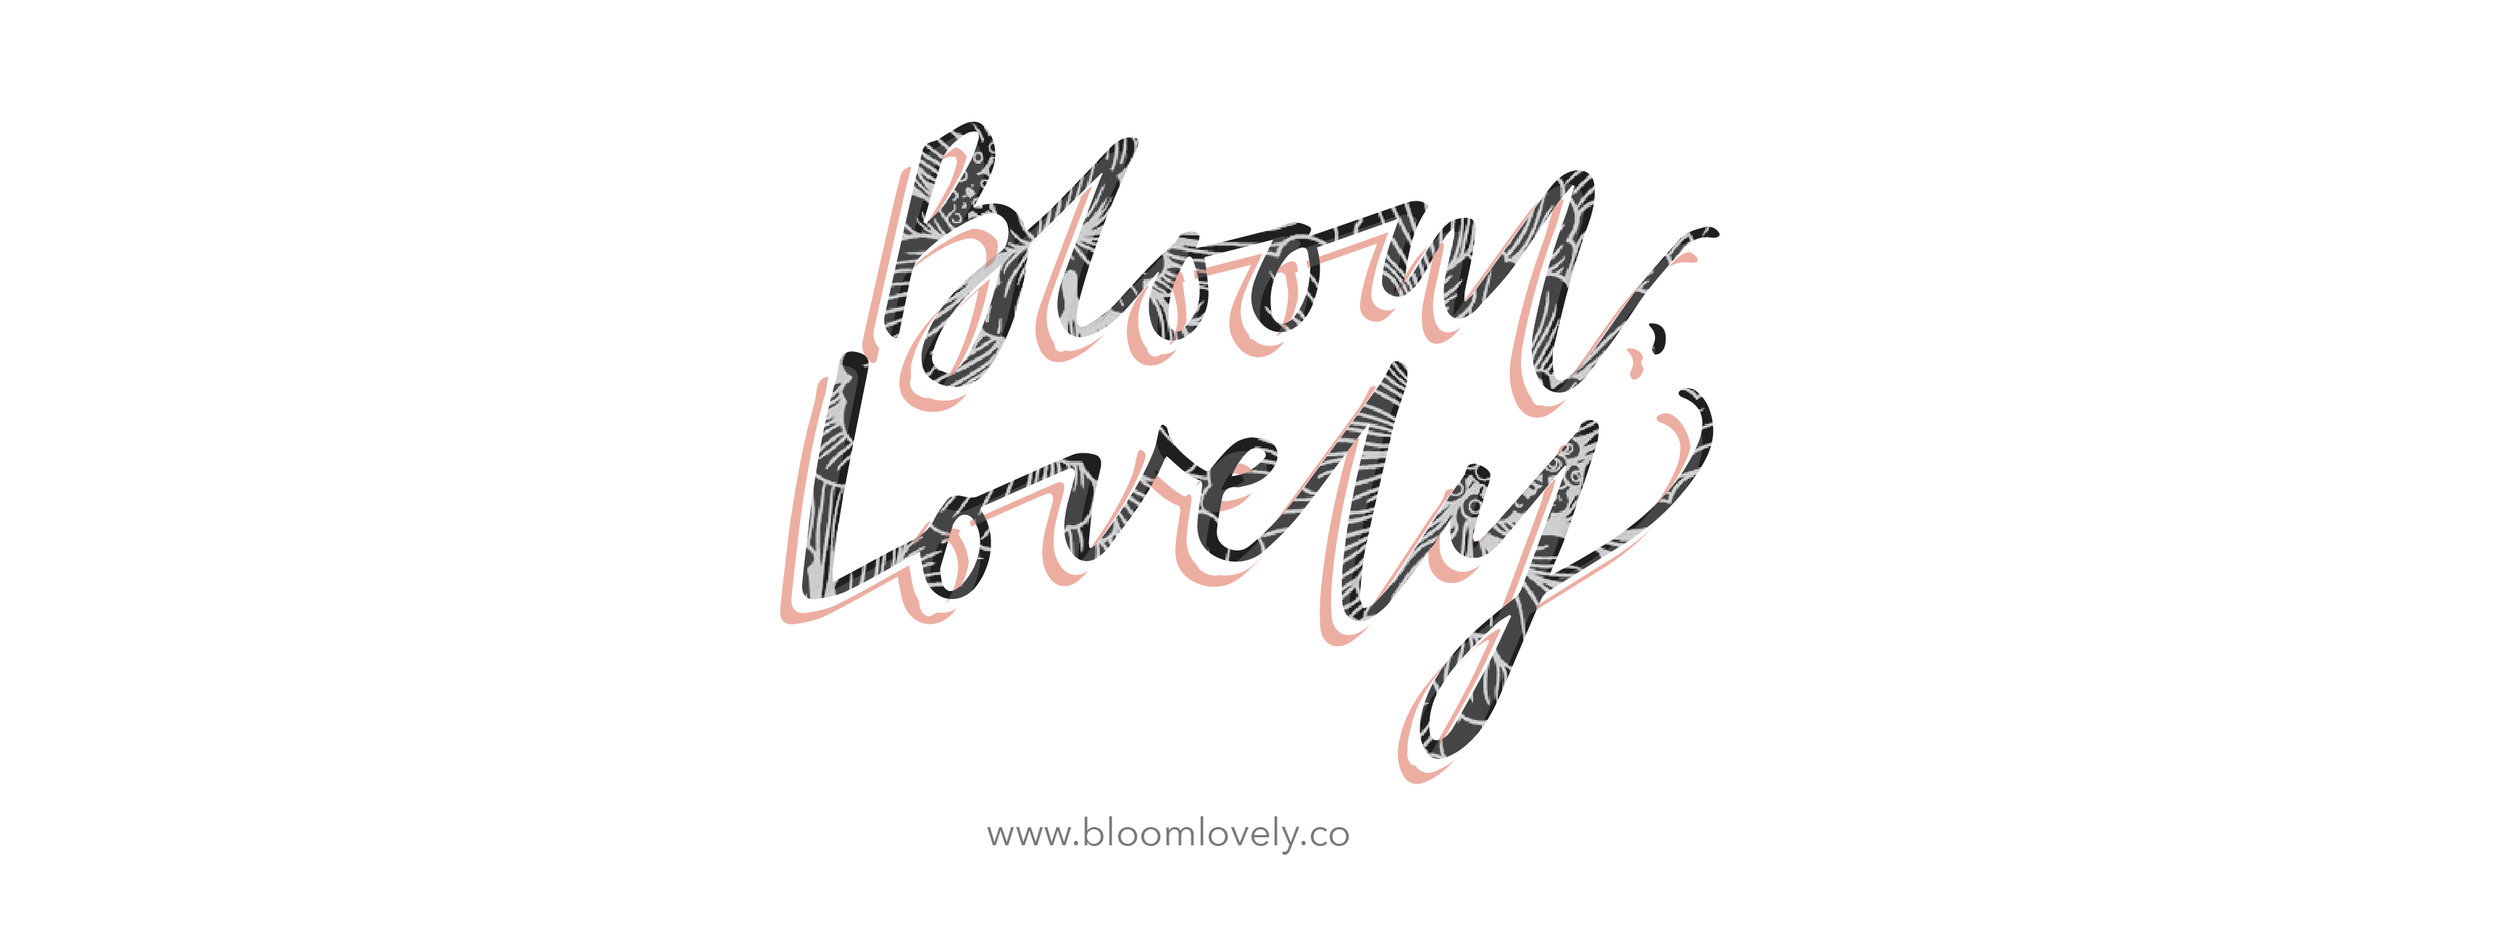 Bloom Lovely color.png